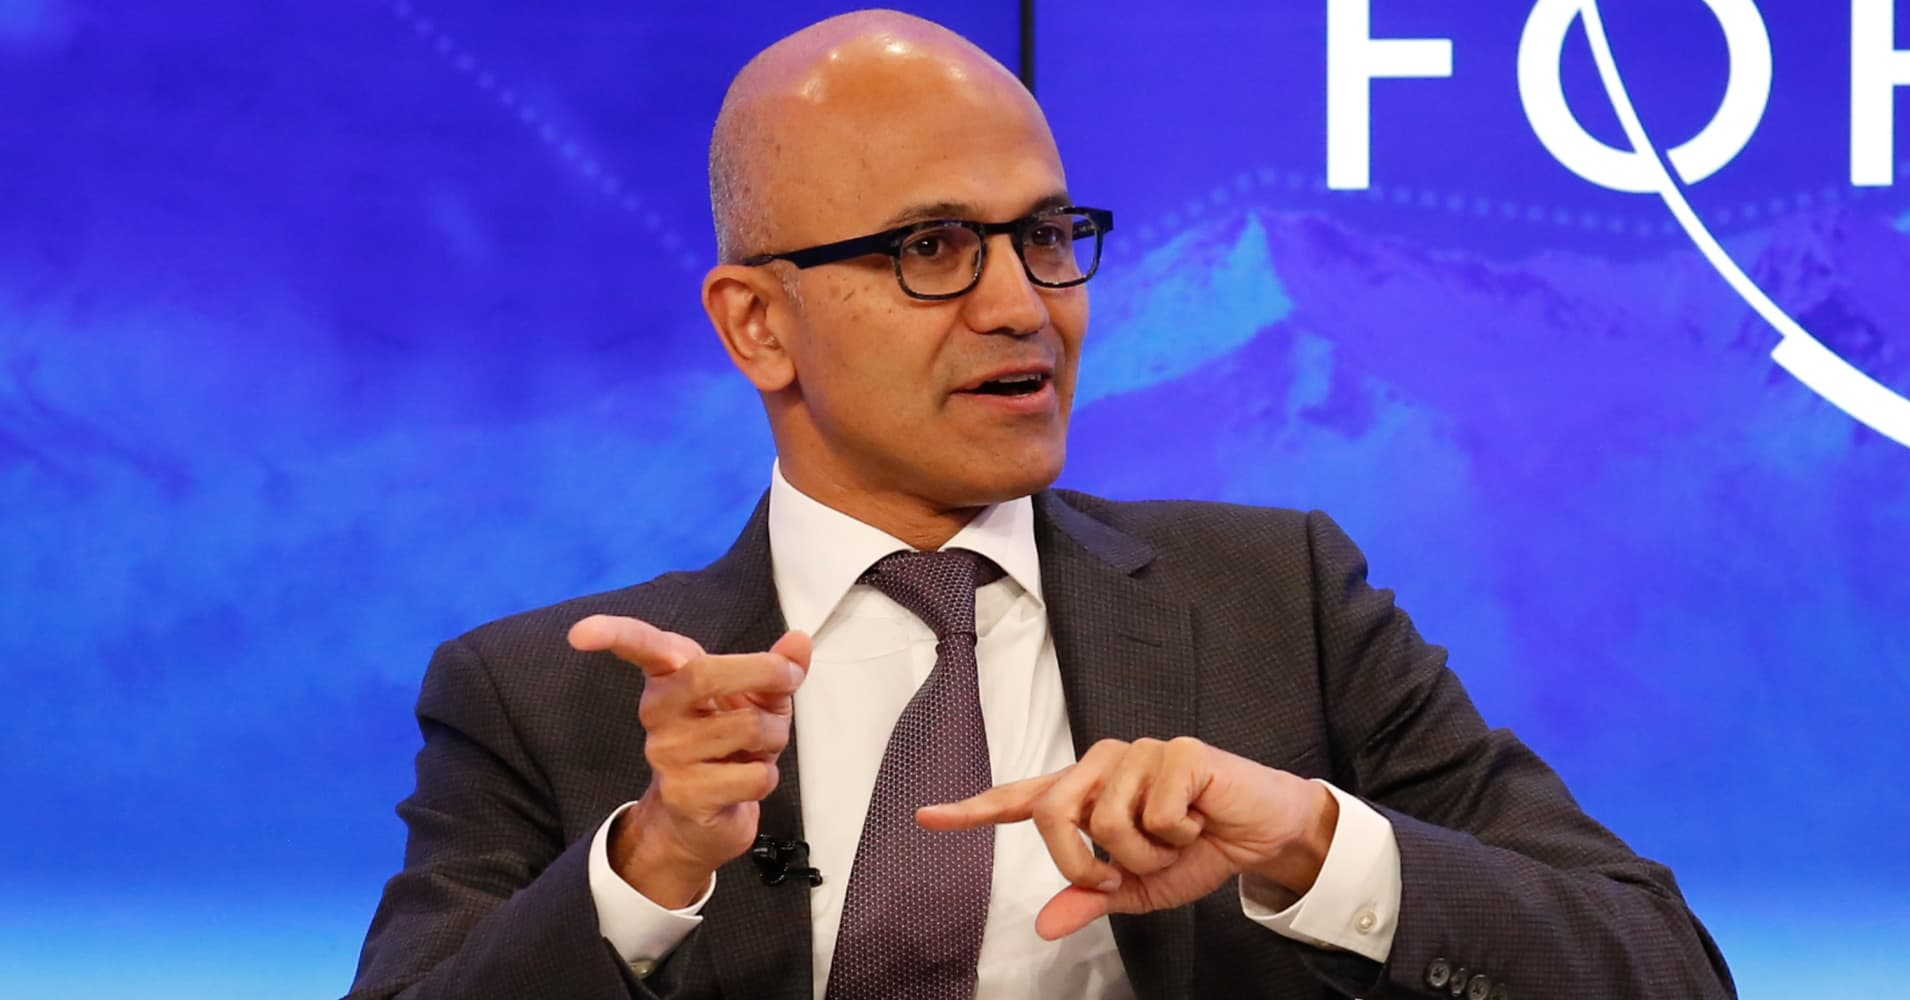 Since breaking its Microsoft habit, Hortonworks has rewarded investors